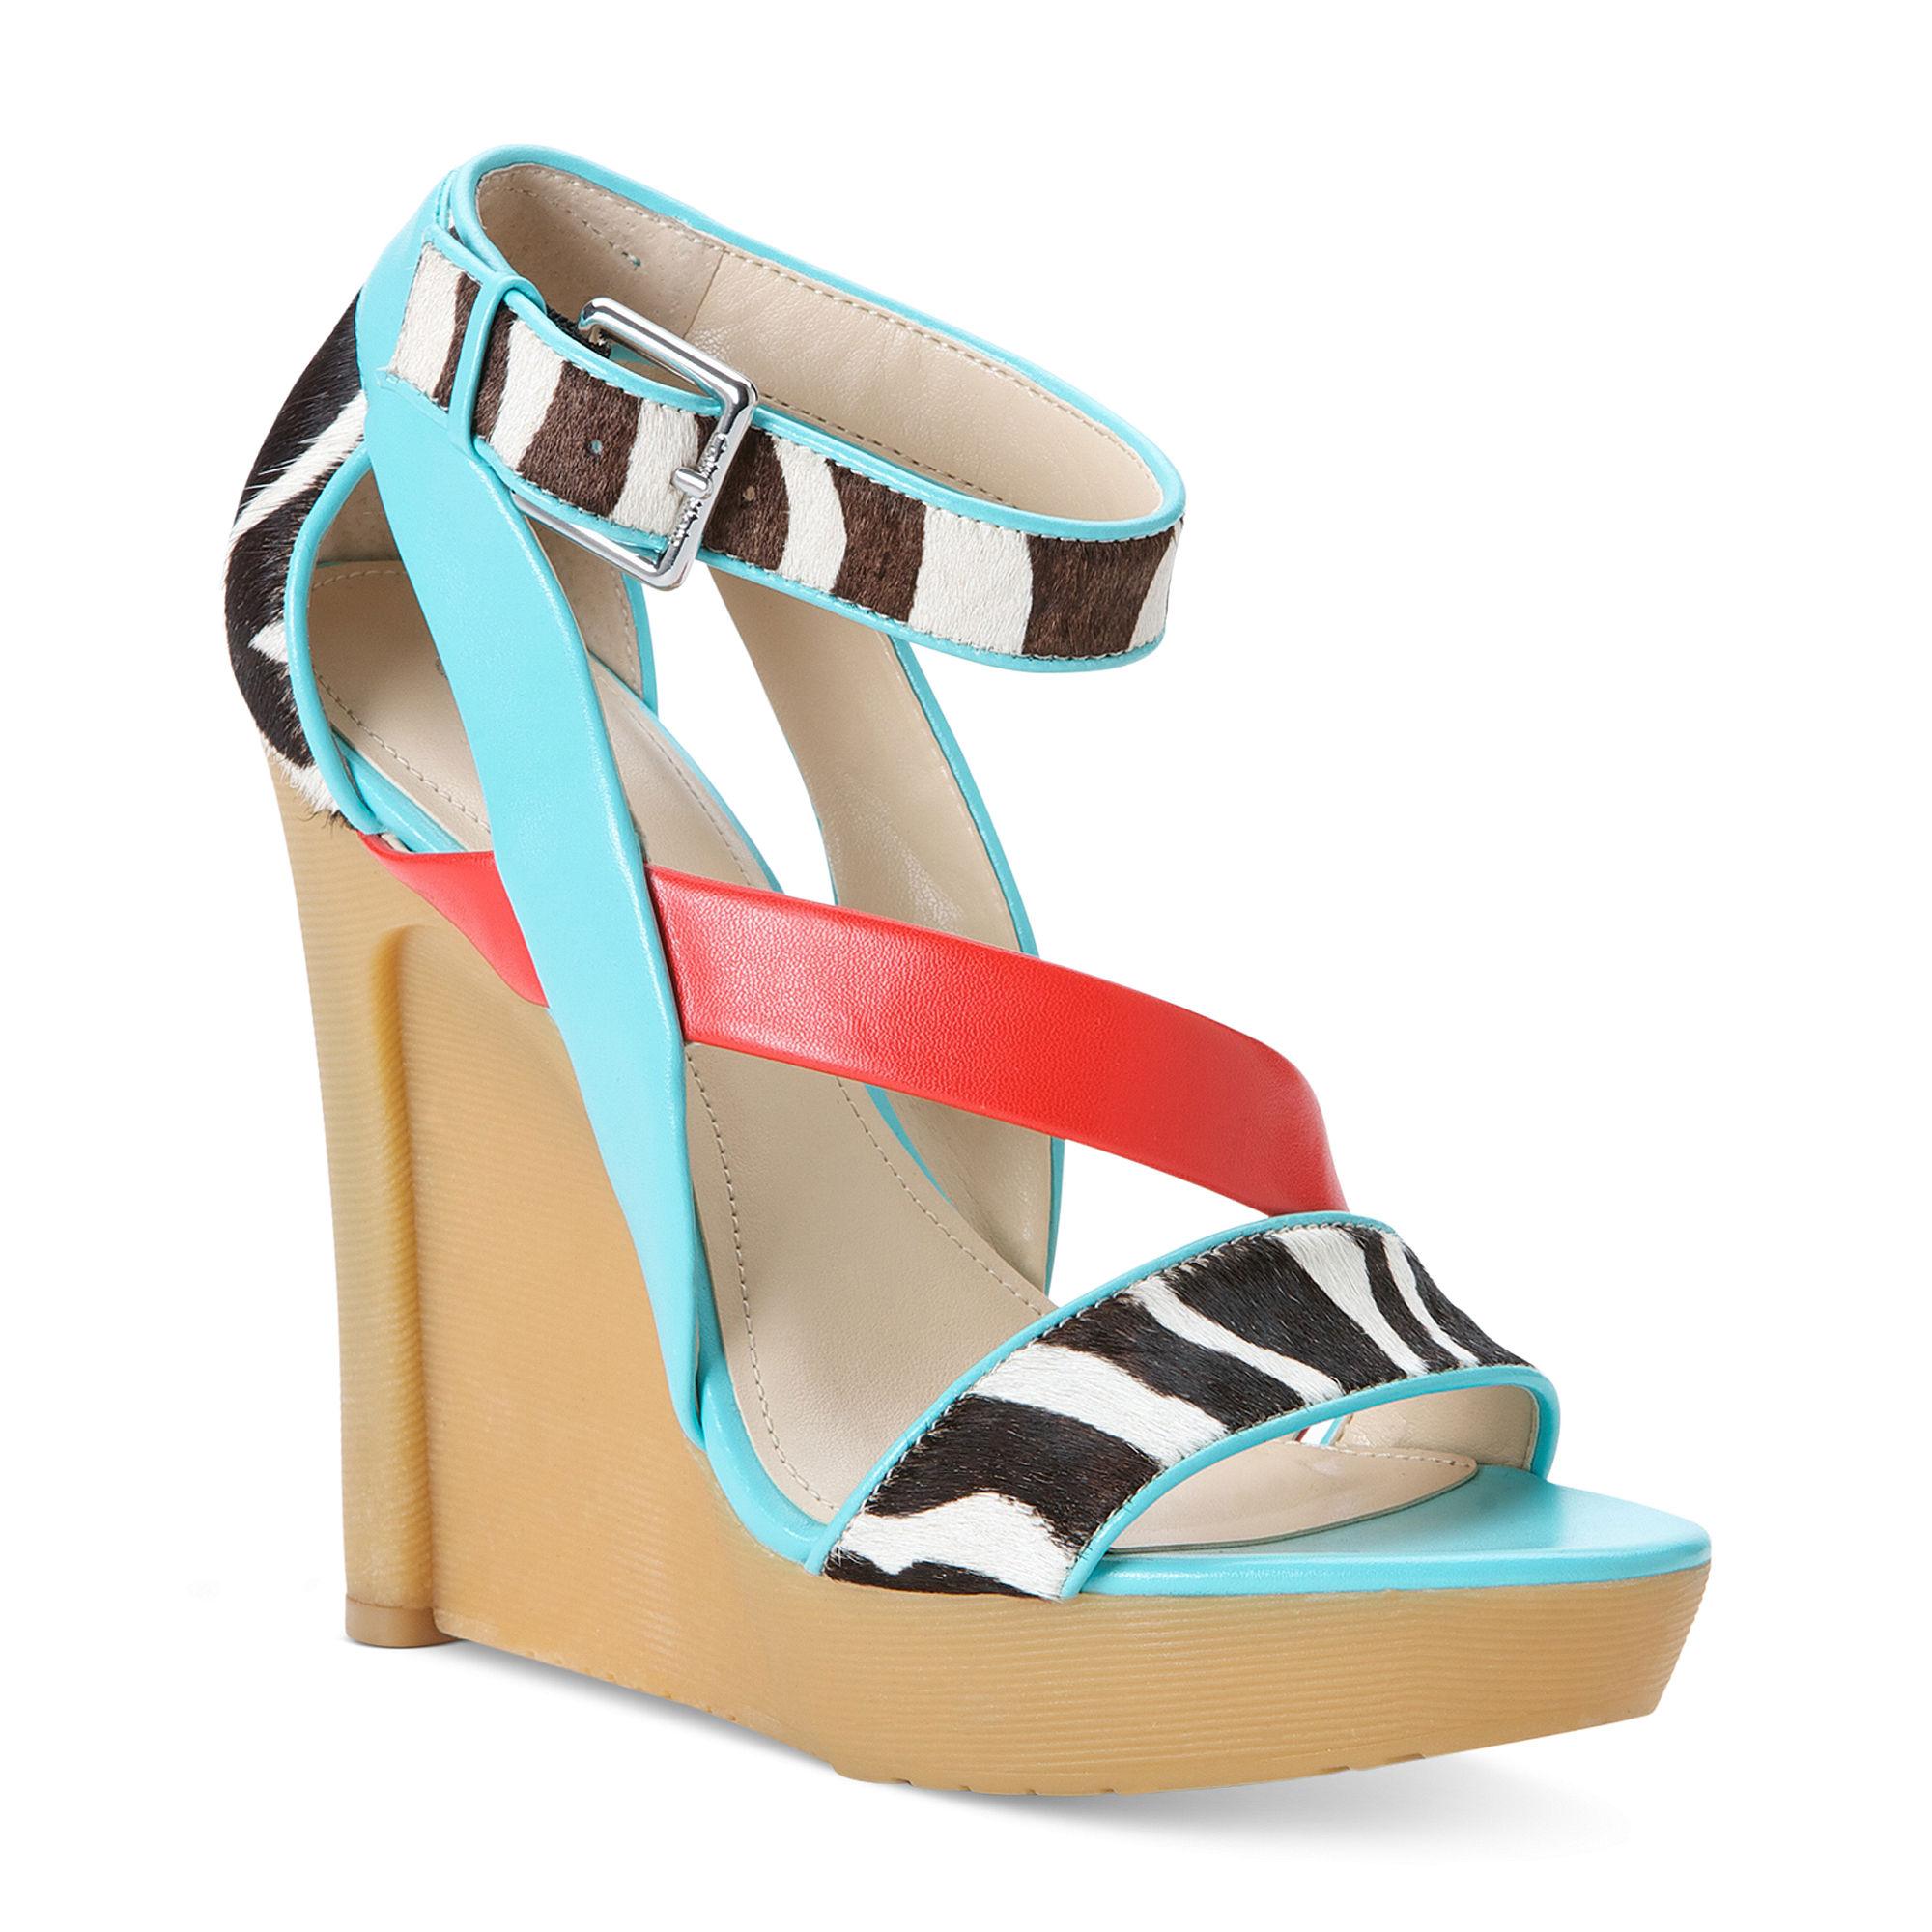 calvin klein platform wedge sandals in multicolor